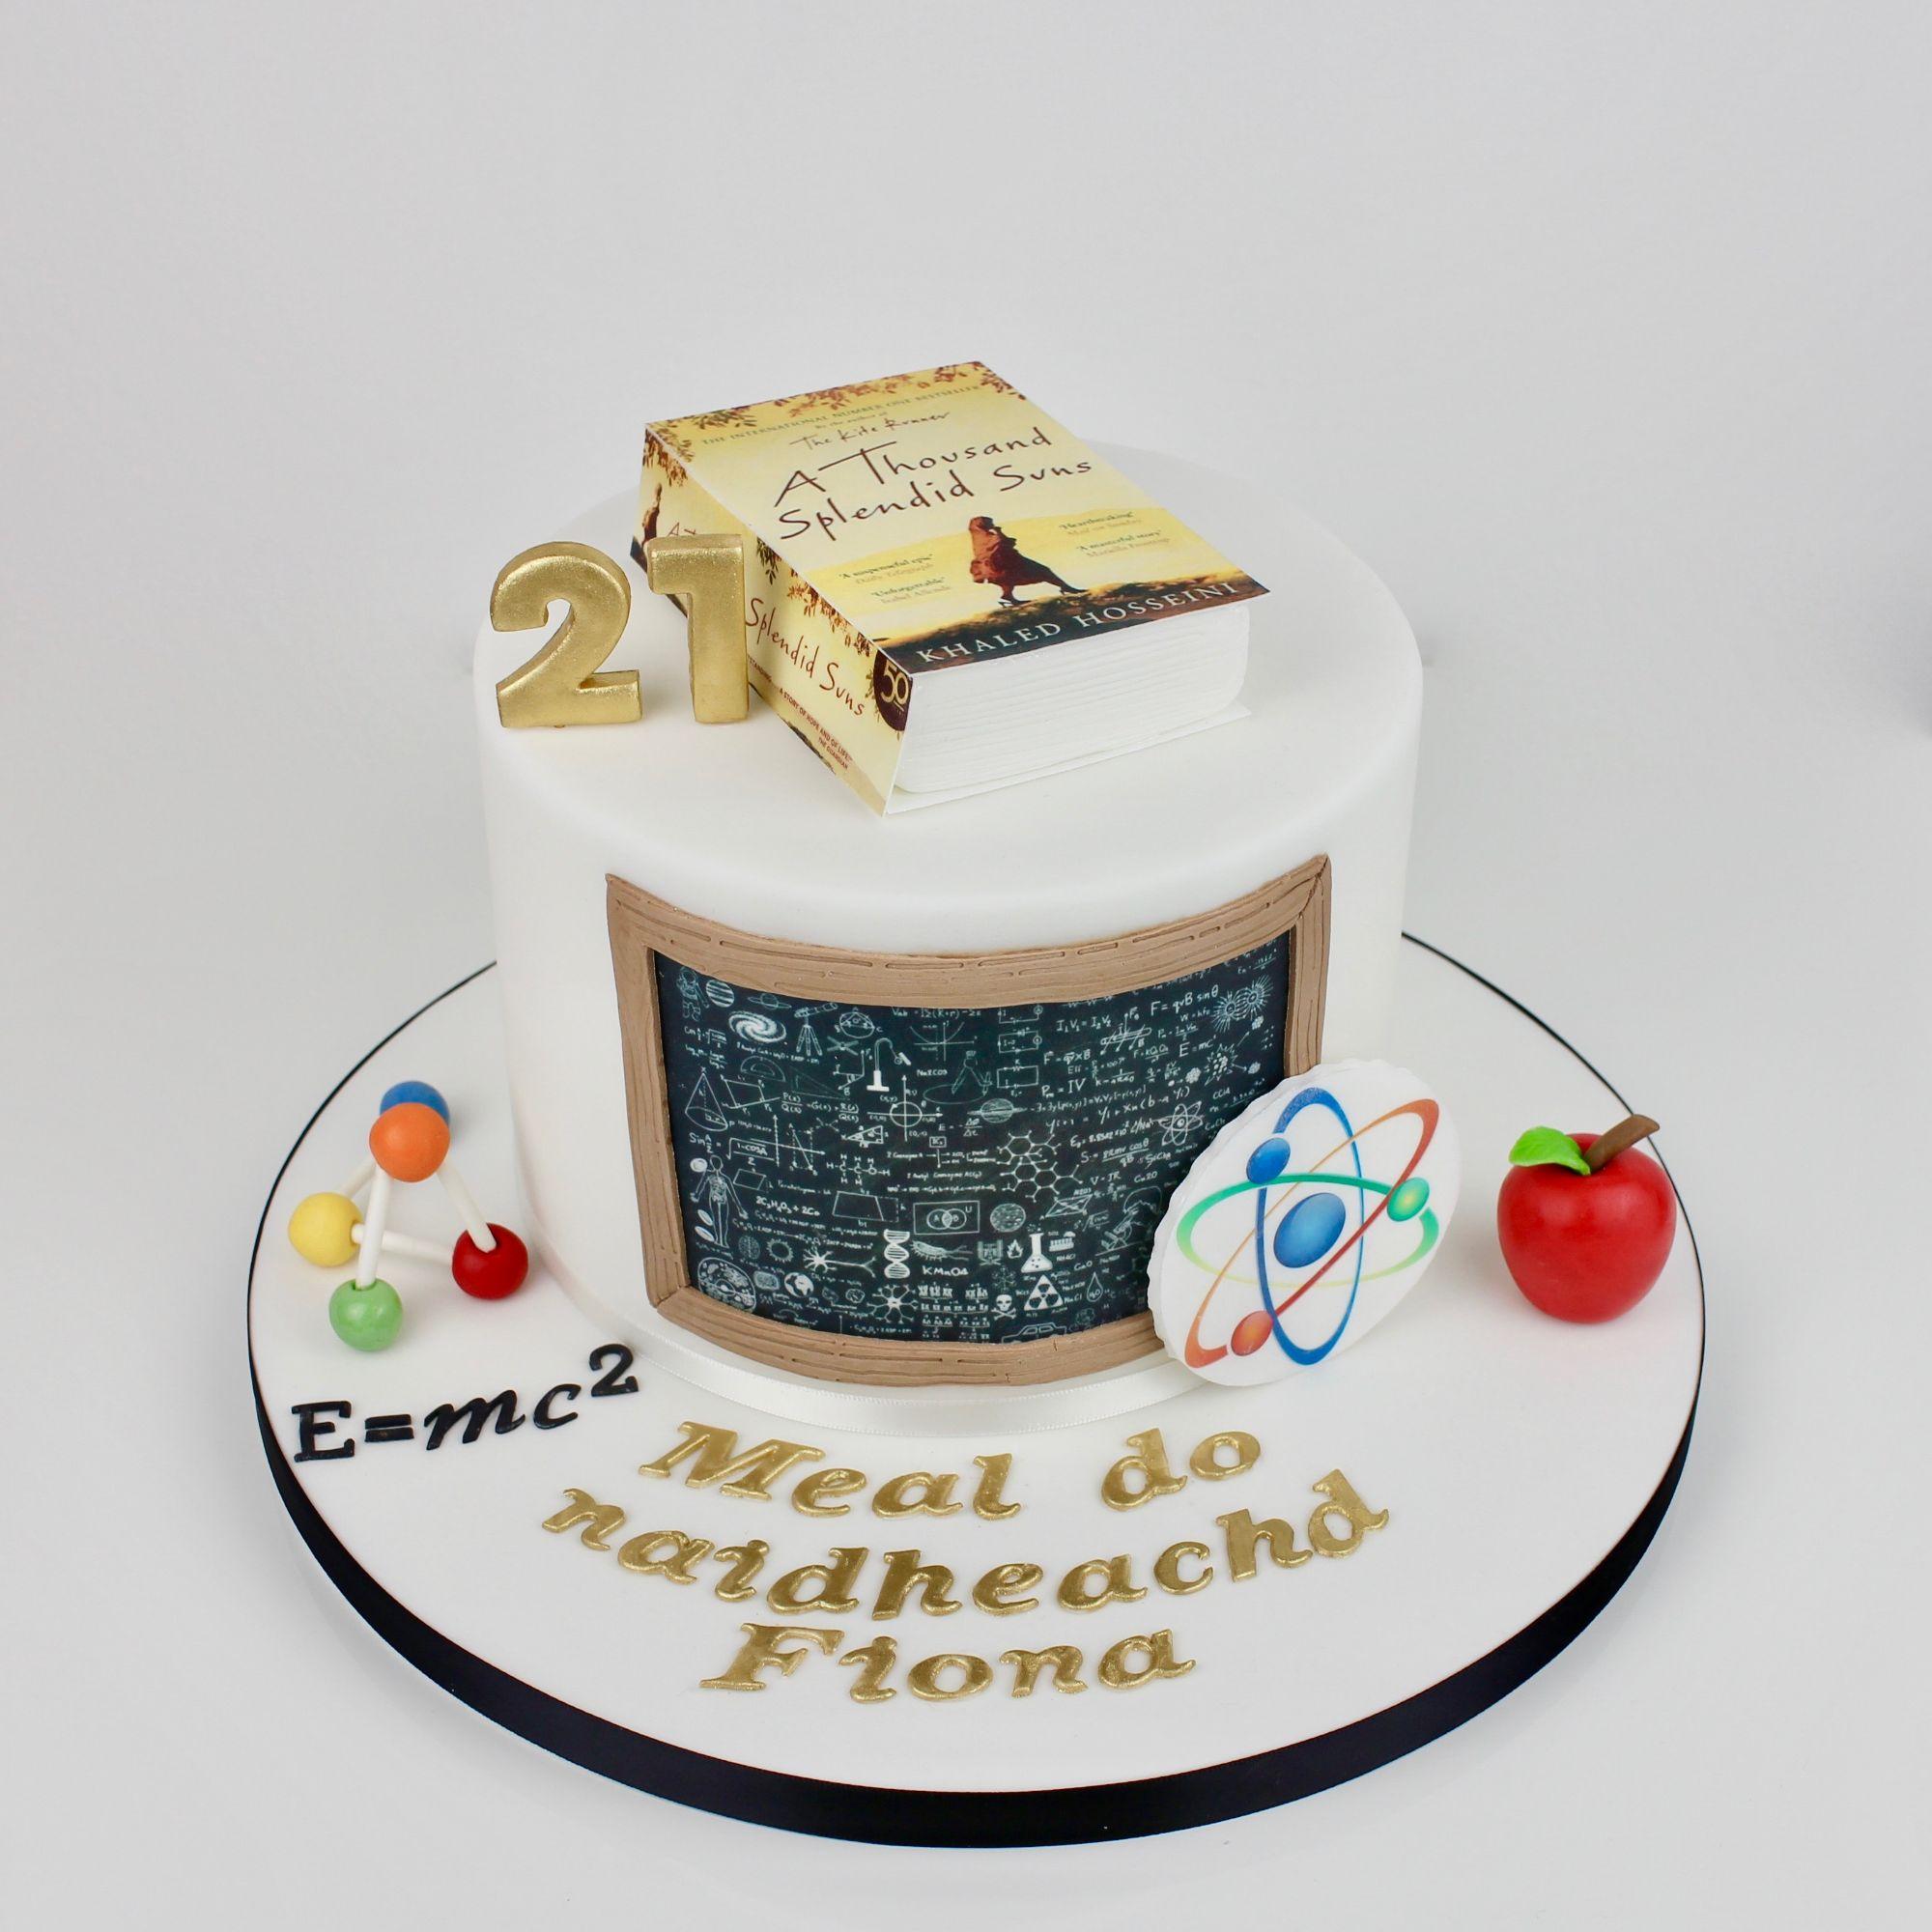 Physics & reading book cake